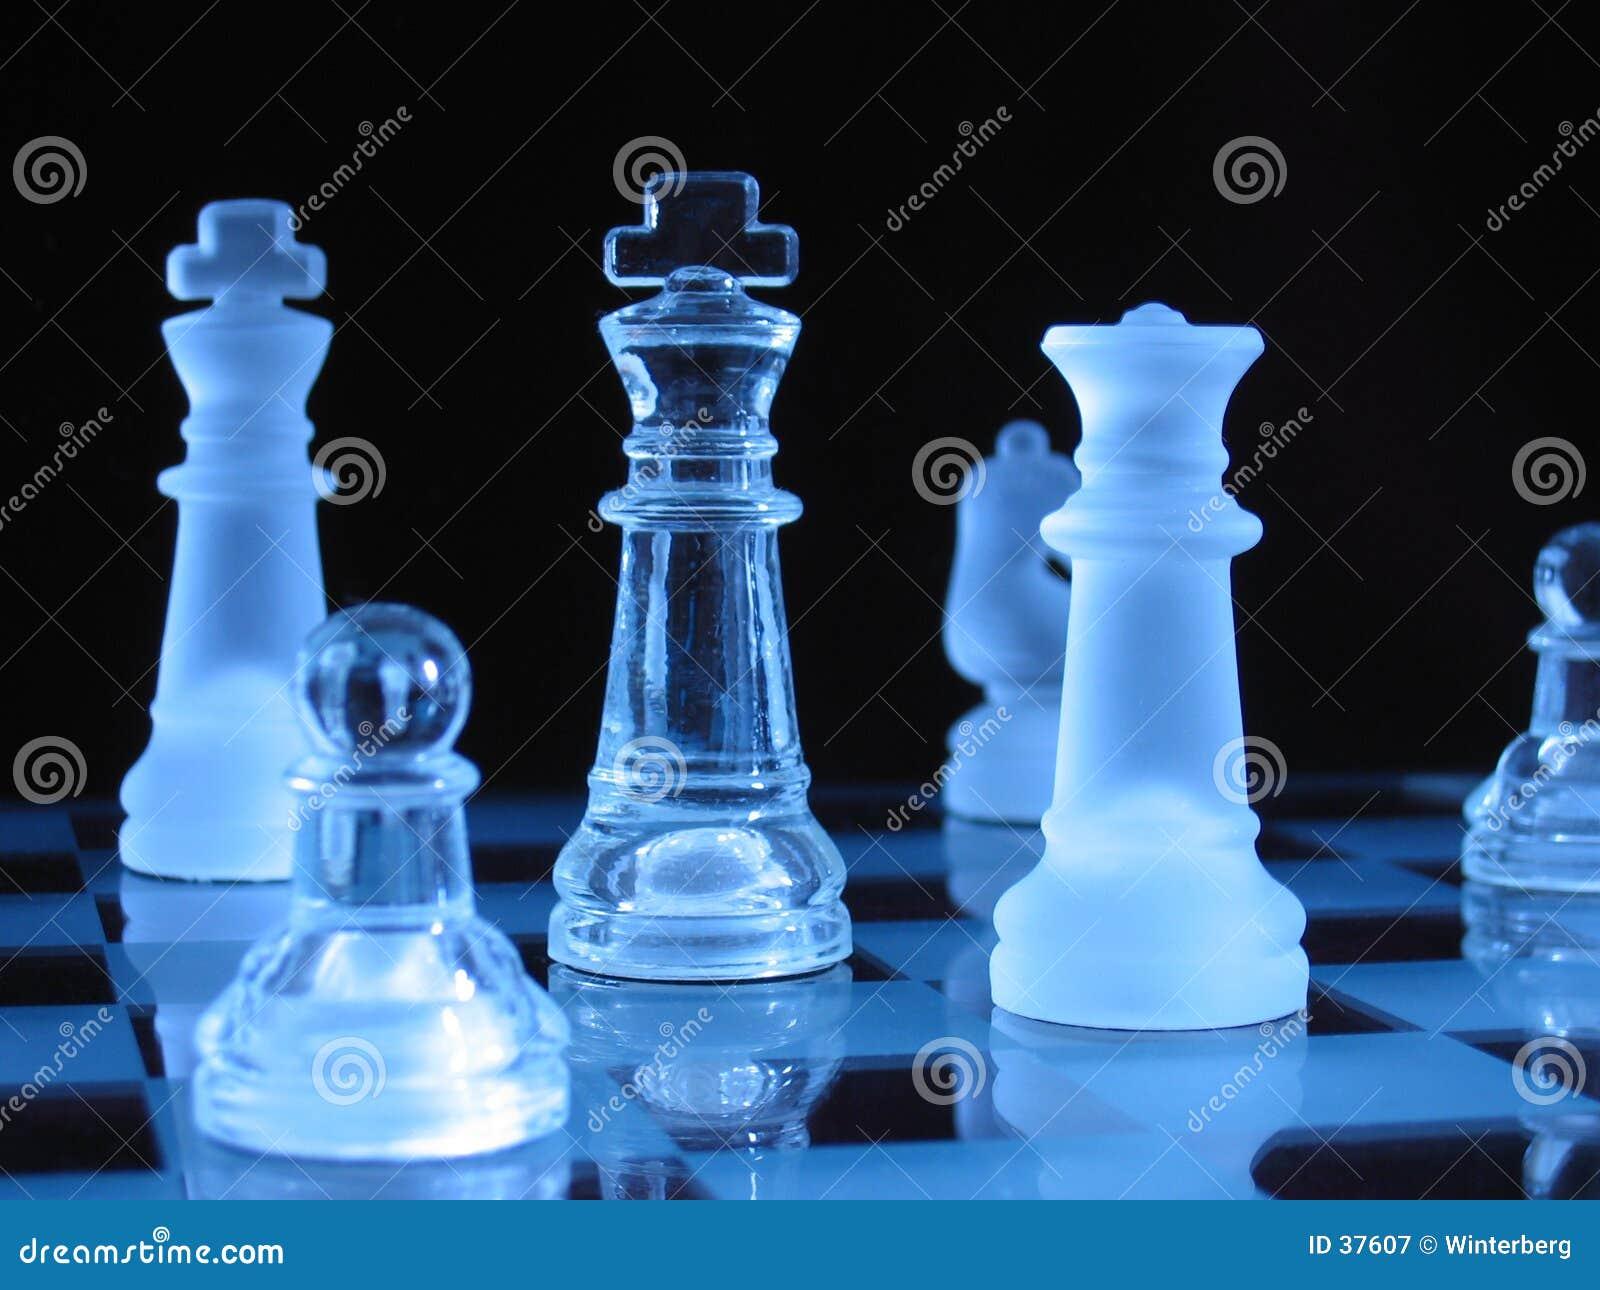 Download Piezas De Ajedrez De Cristal Imagen de archivo - Imagen de chessmen, oscuro: 37607